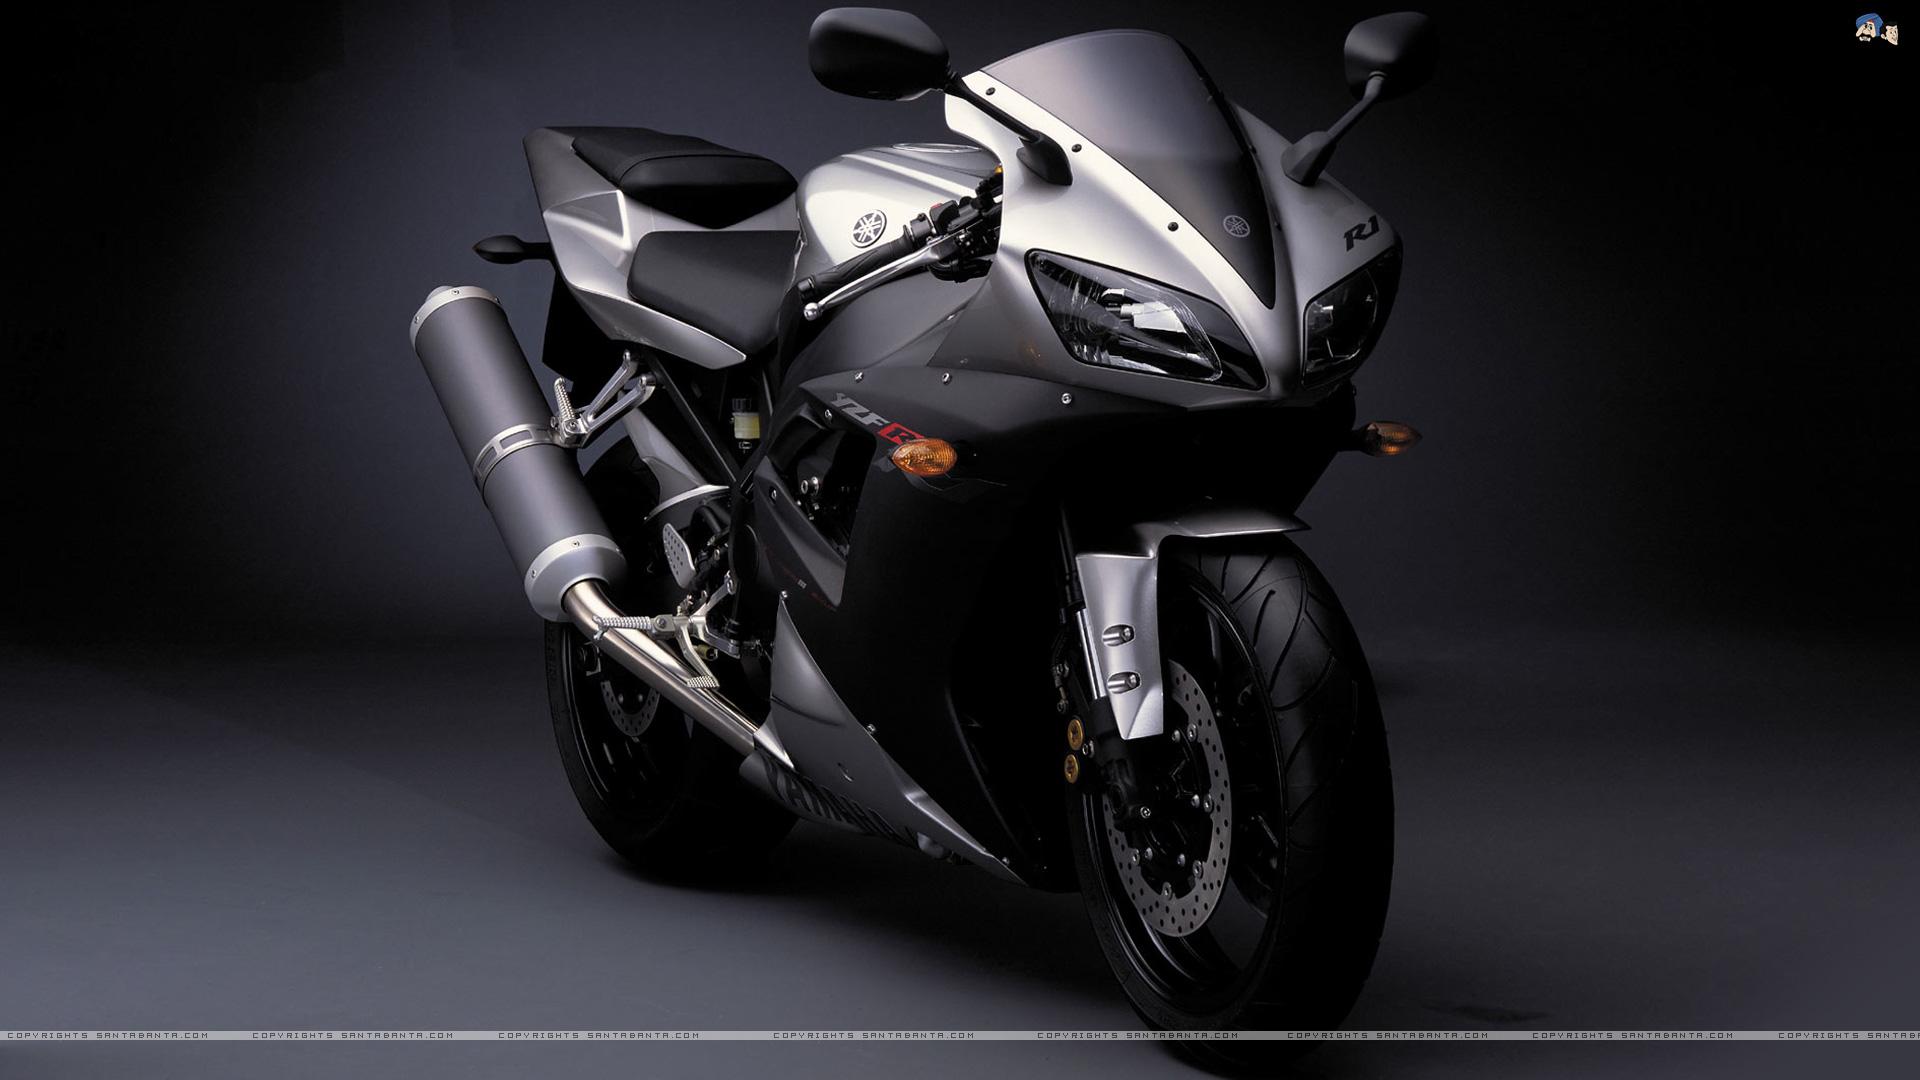 Yamaha Yamaha YZF R1 Motorcycle Motorcycles 1920x1080 1920x1080